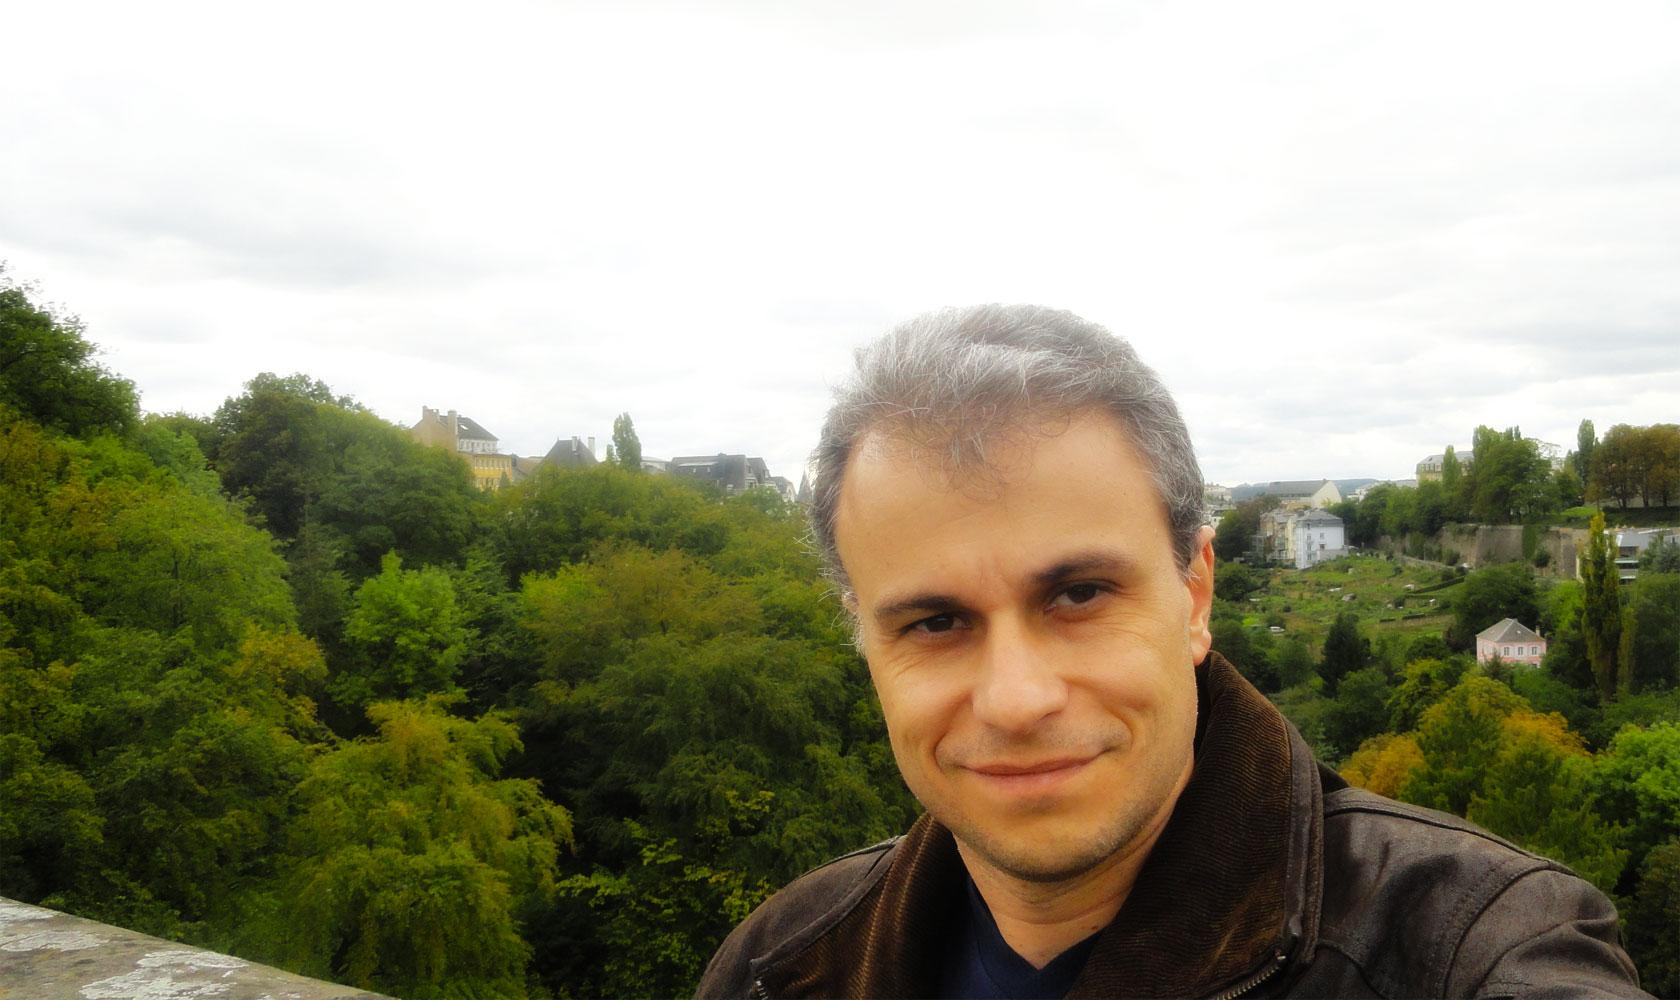 Marcelo Simão de Vasconcellos